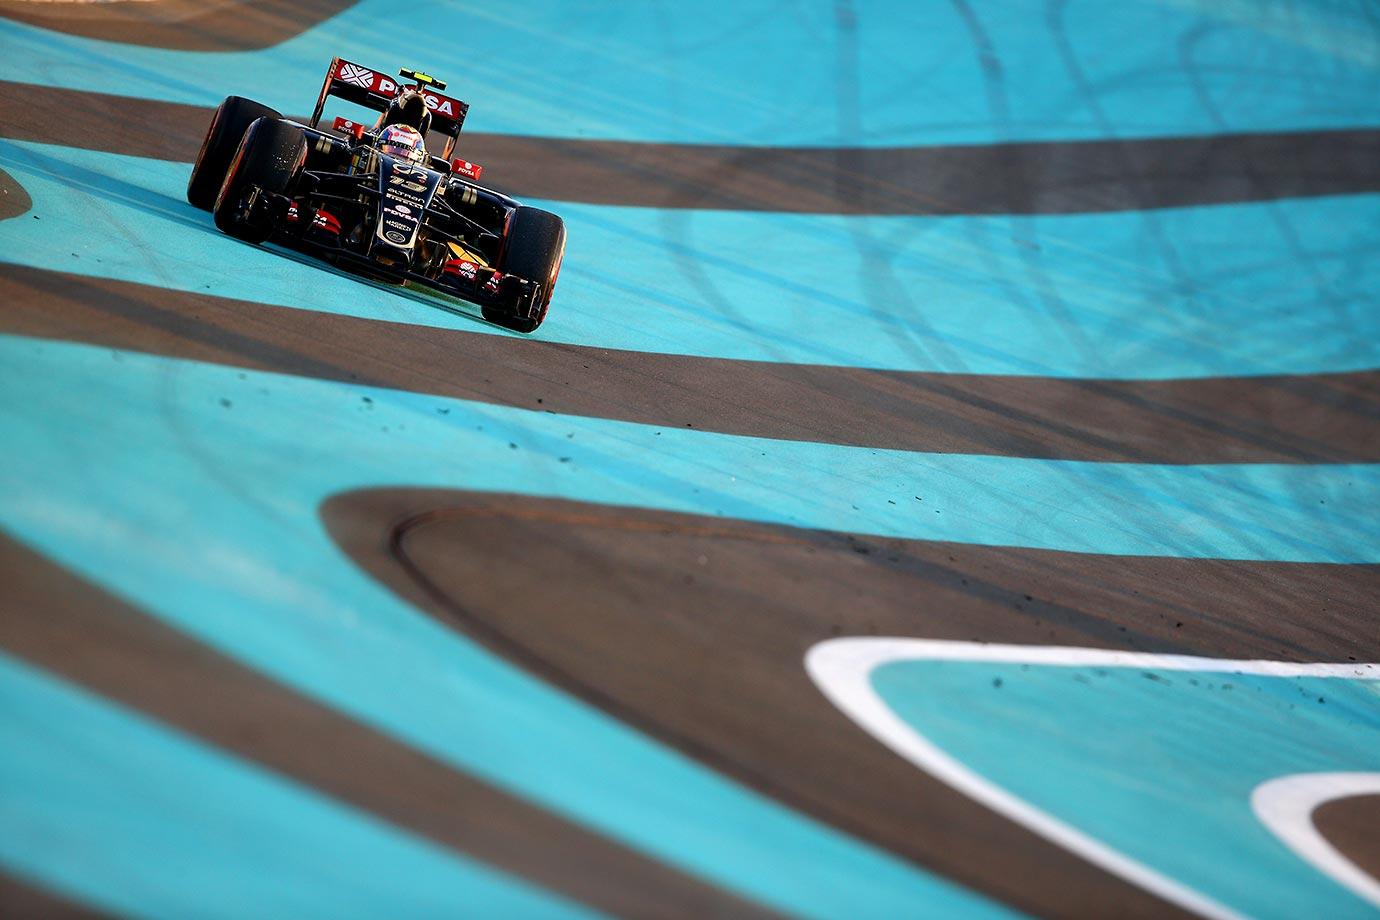 Pastor Maldonado runs wide during the Abu Dhabi Formula One Grand Prix.